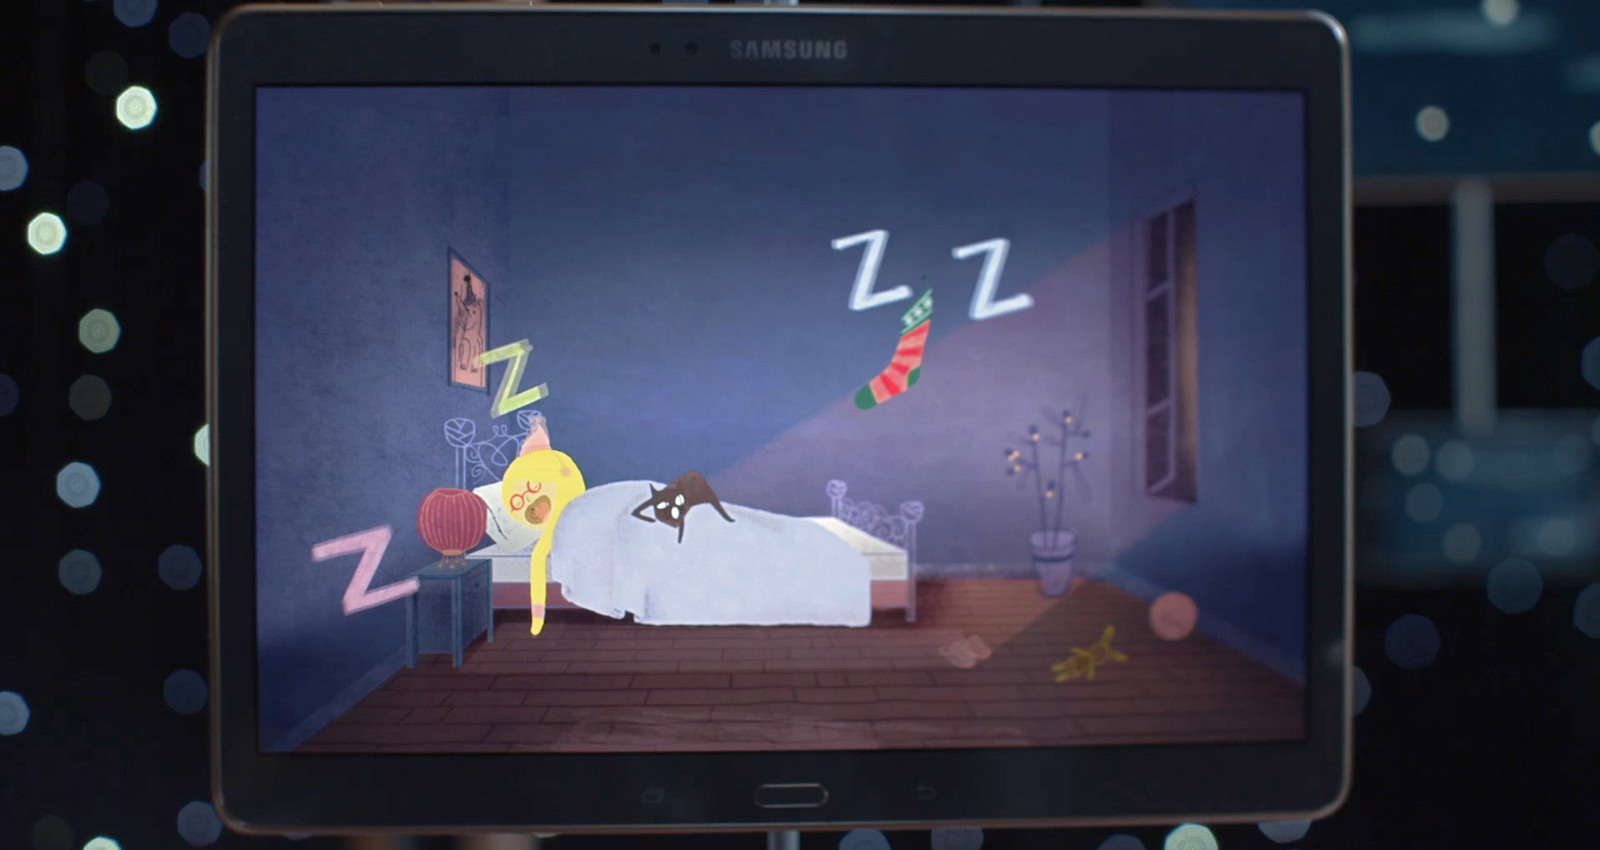 Samsung Holiday Dreams